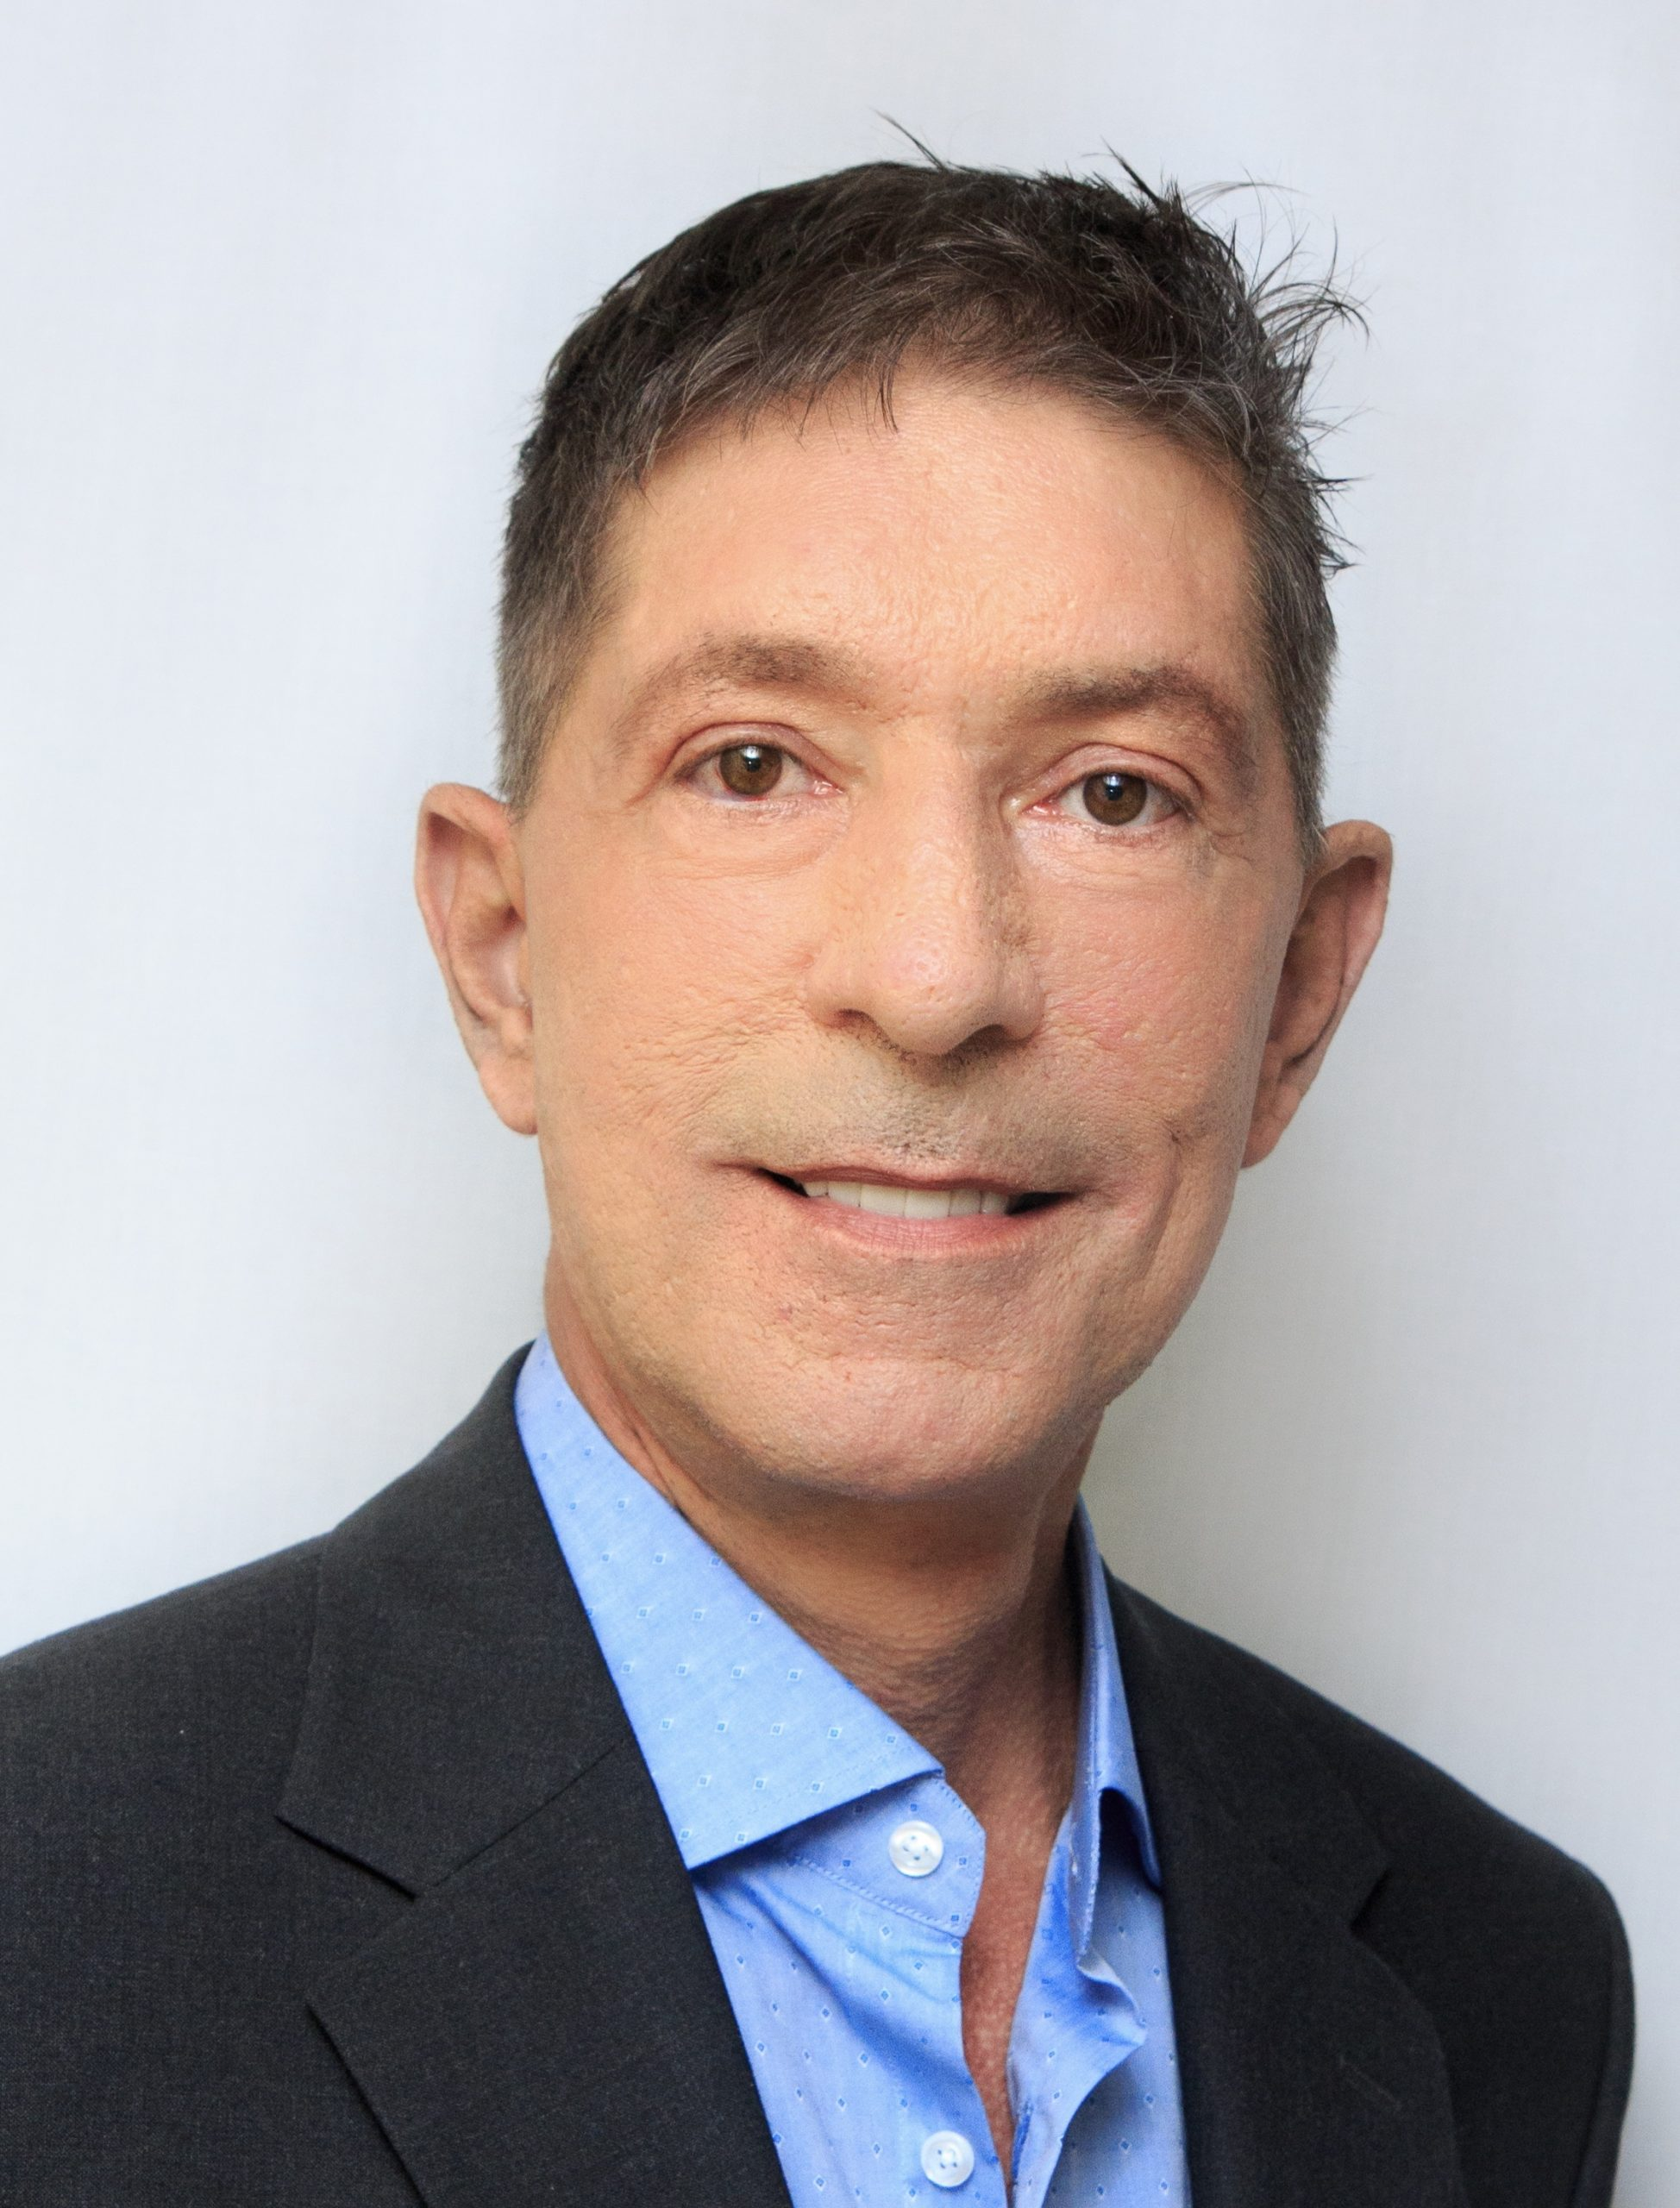 Rick Wietfeldt, MIPI Board Member